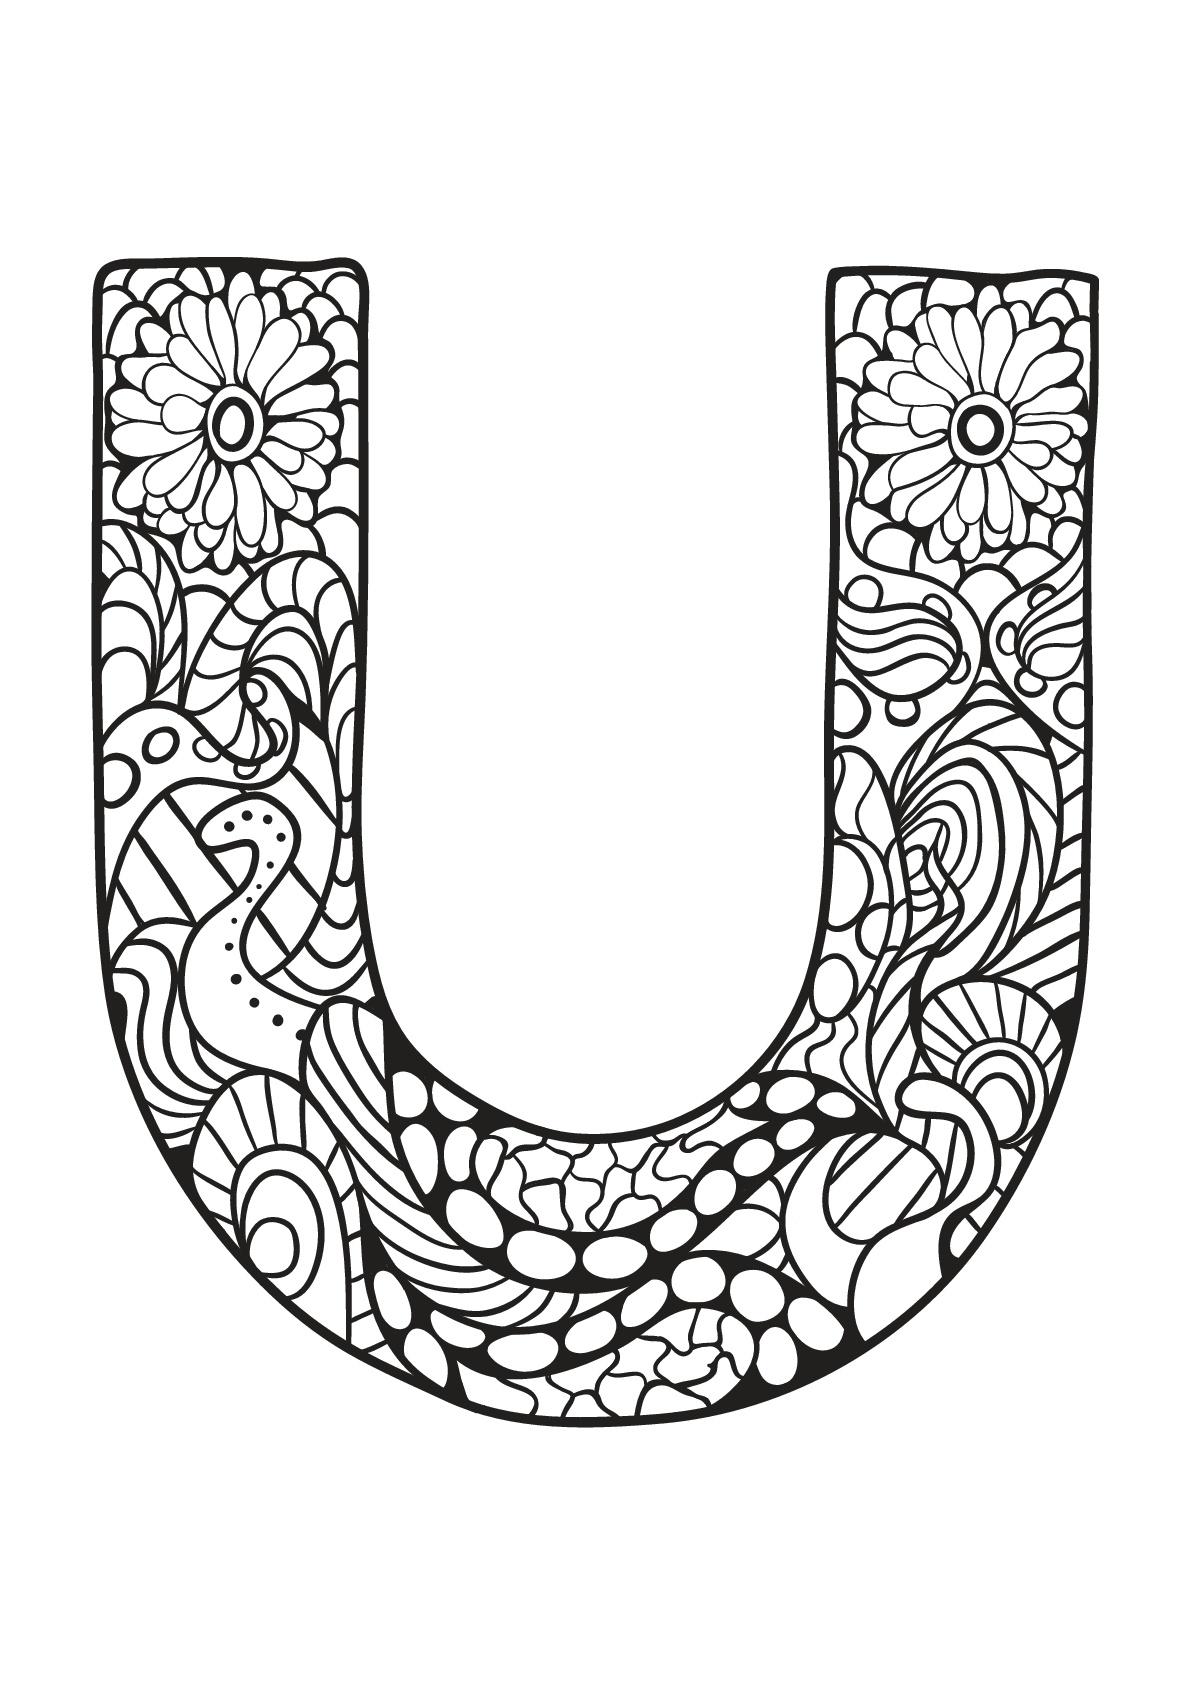 Alphabet To Print For Free